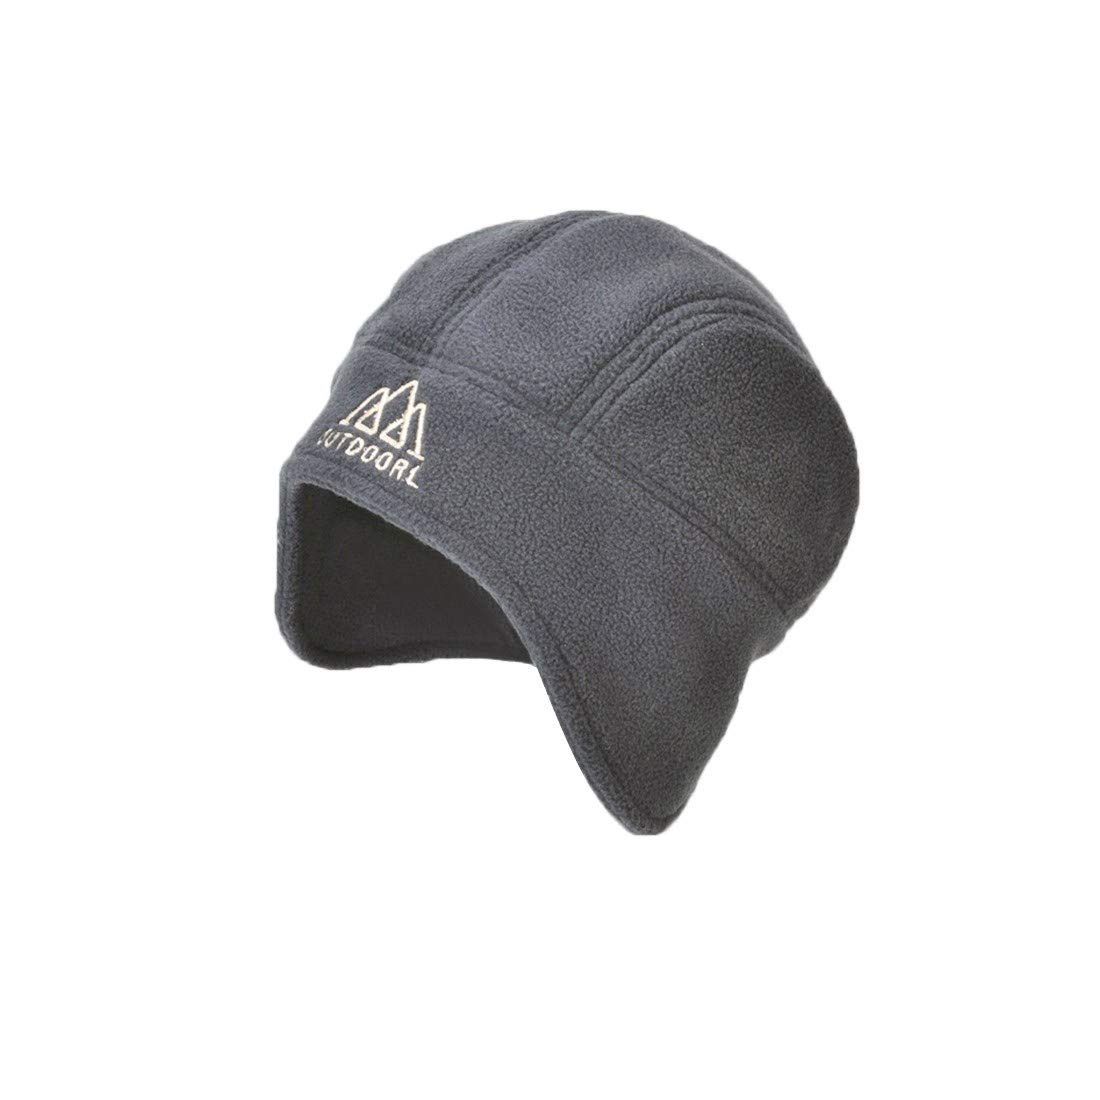 ccf5527fc78 Amazon.com  LLmoway Skull Cap with Ear Flaps